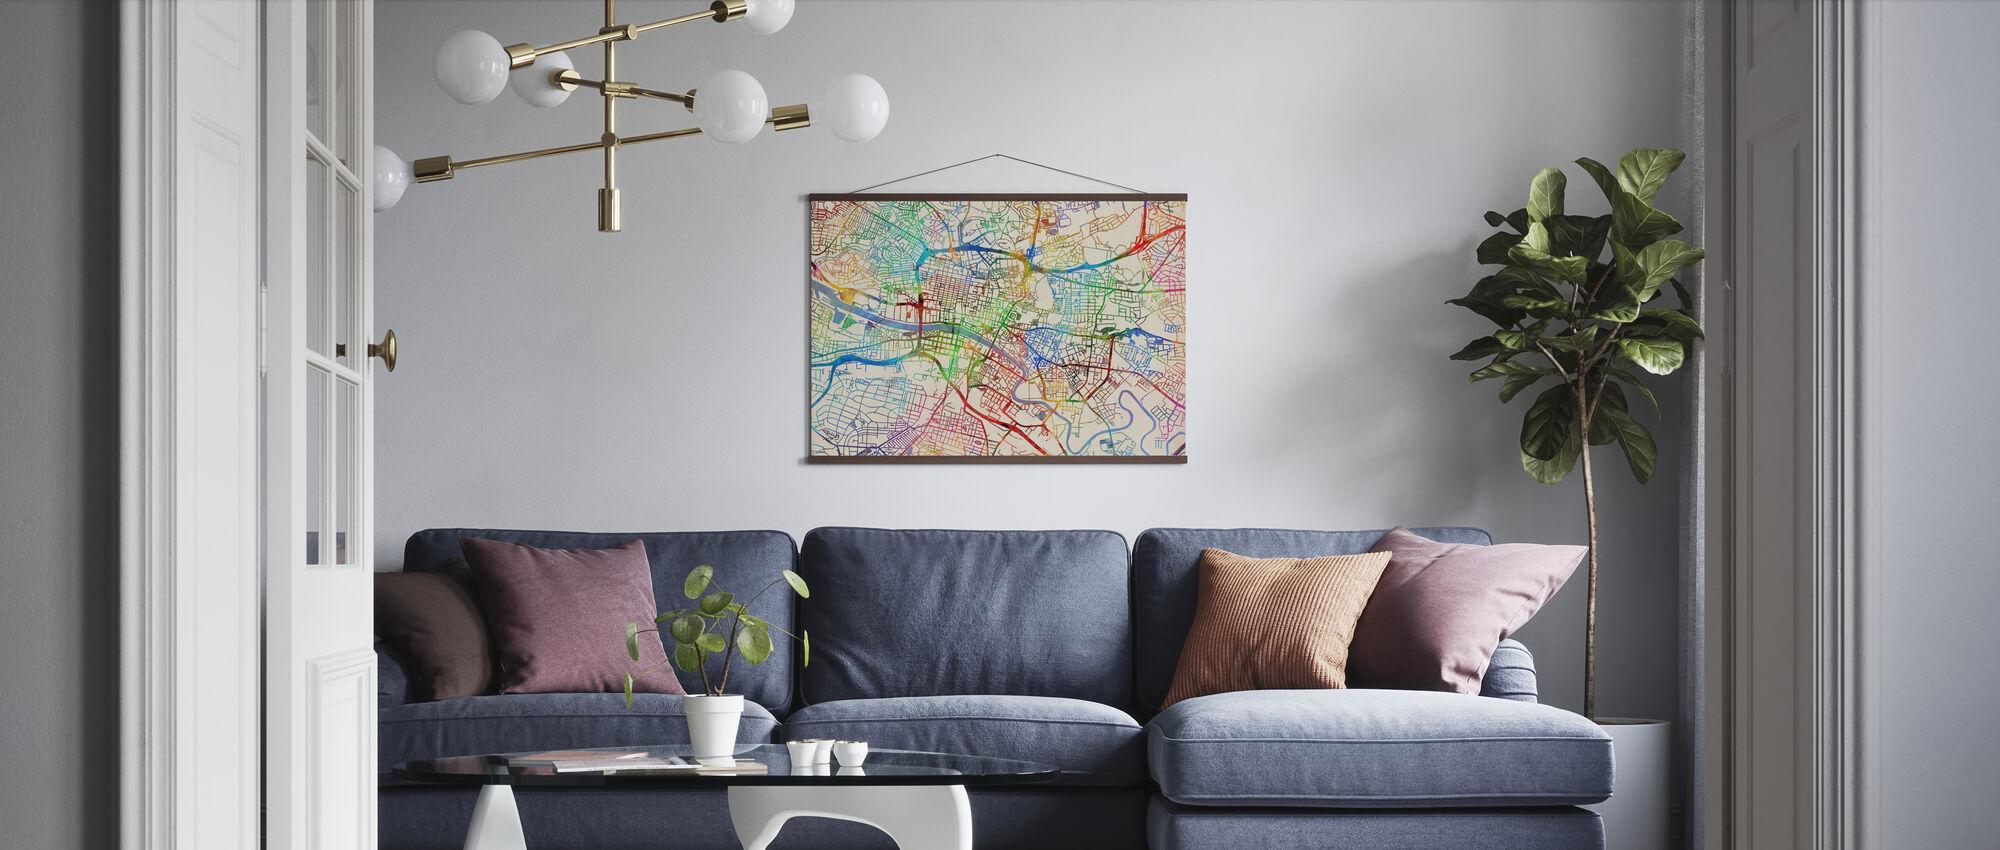 Glasgow Street Map - Poster - Living Room